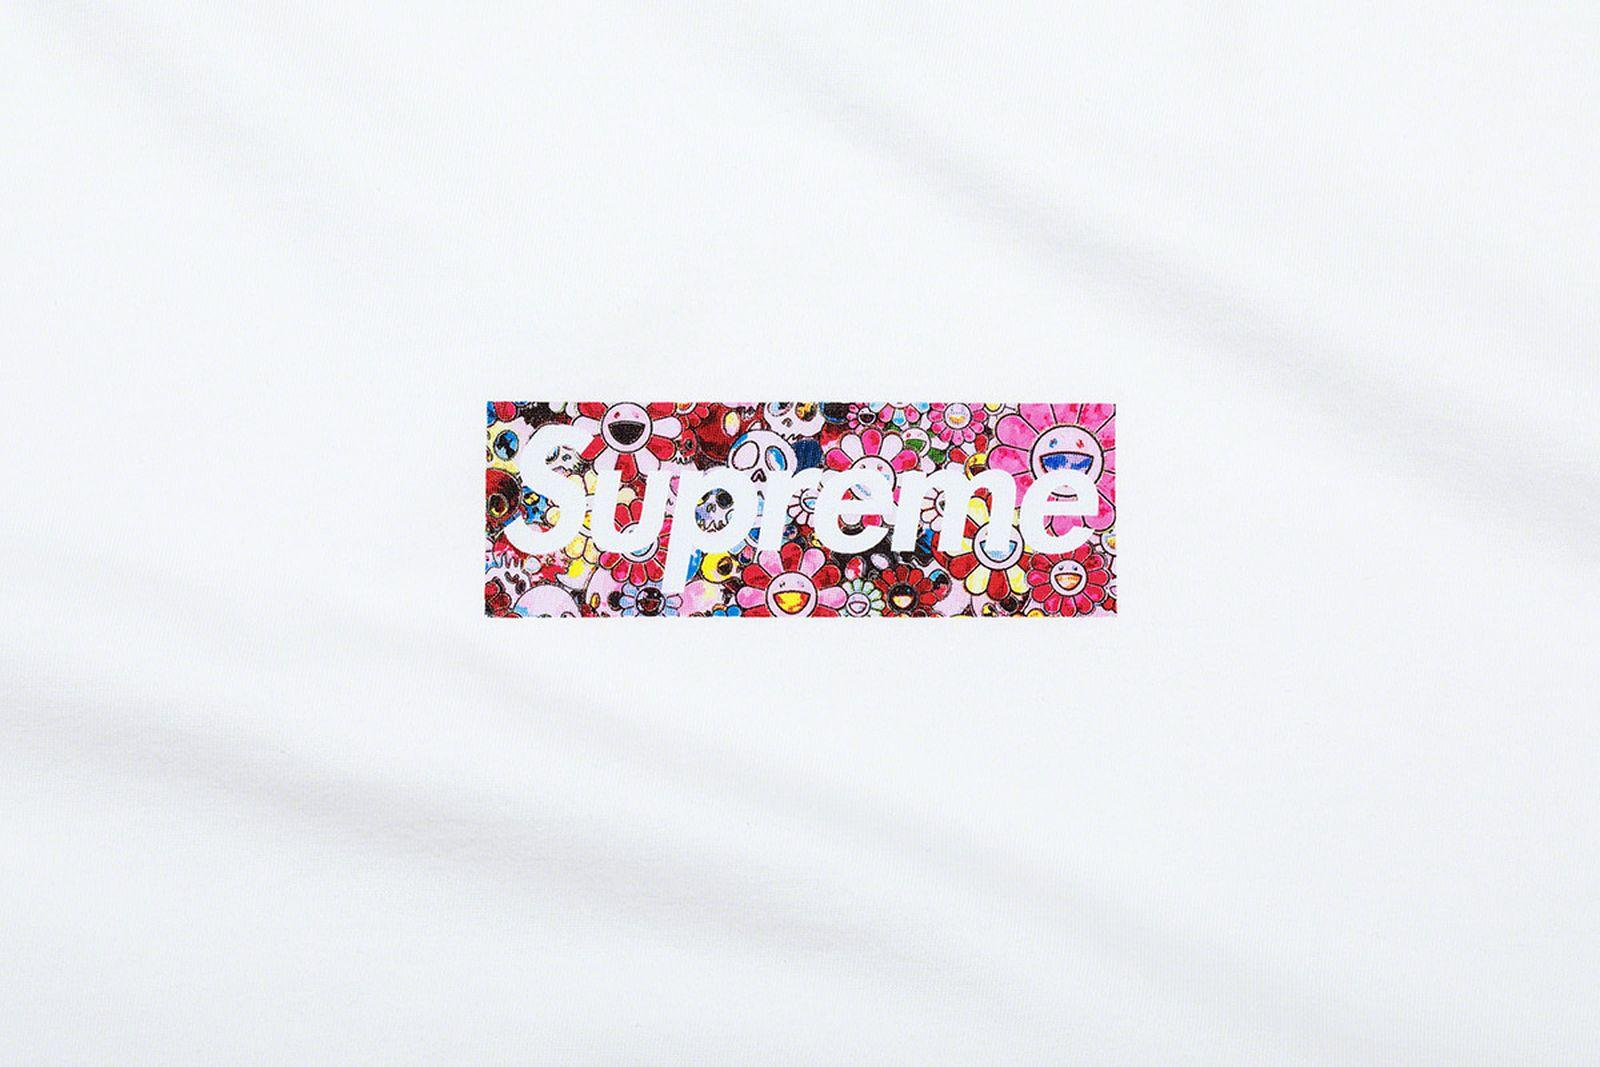 supreme-covid-19-takashi-murakami-bogo-01